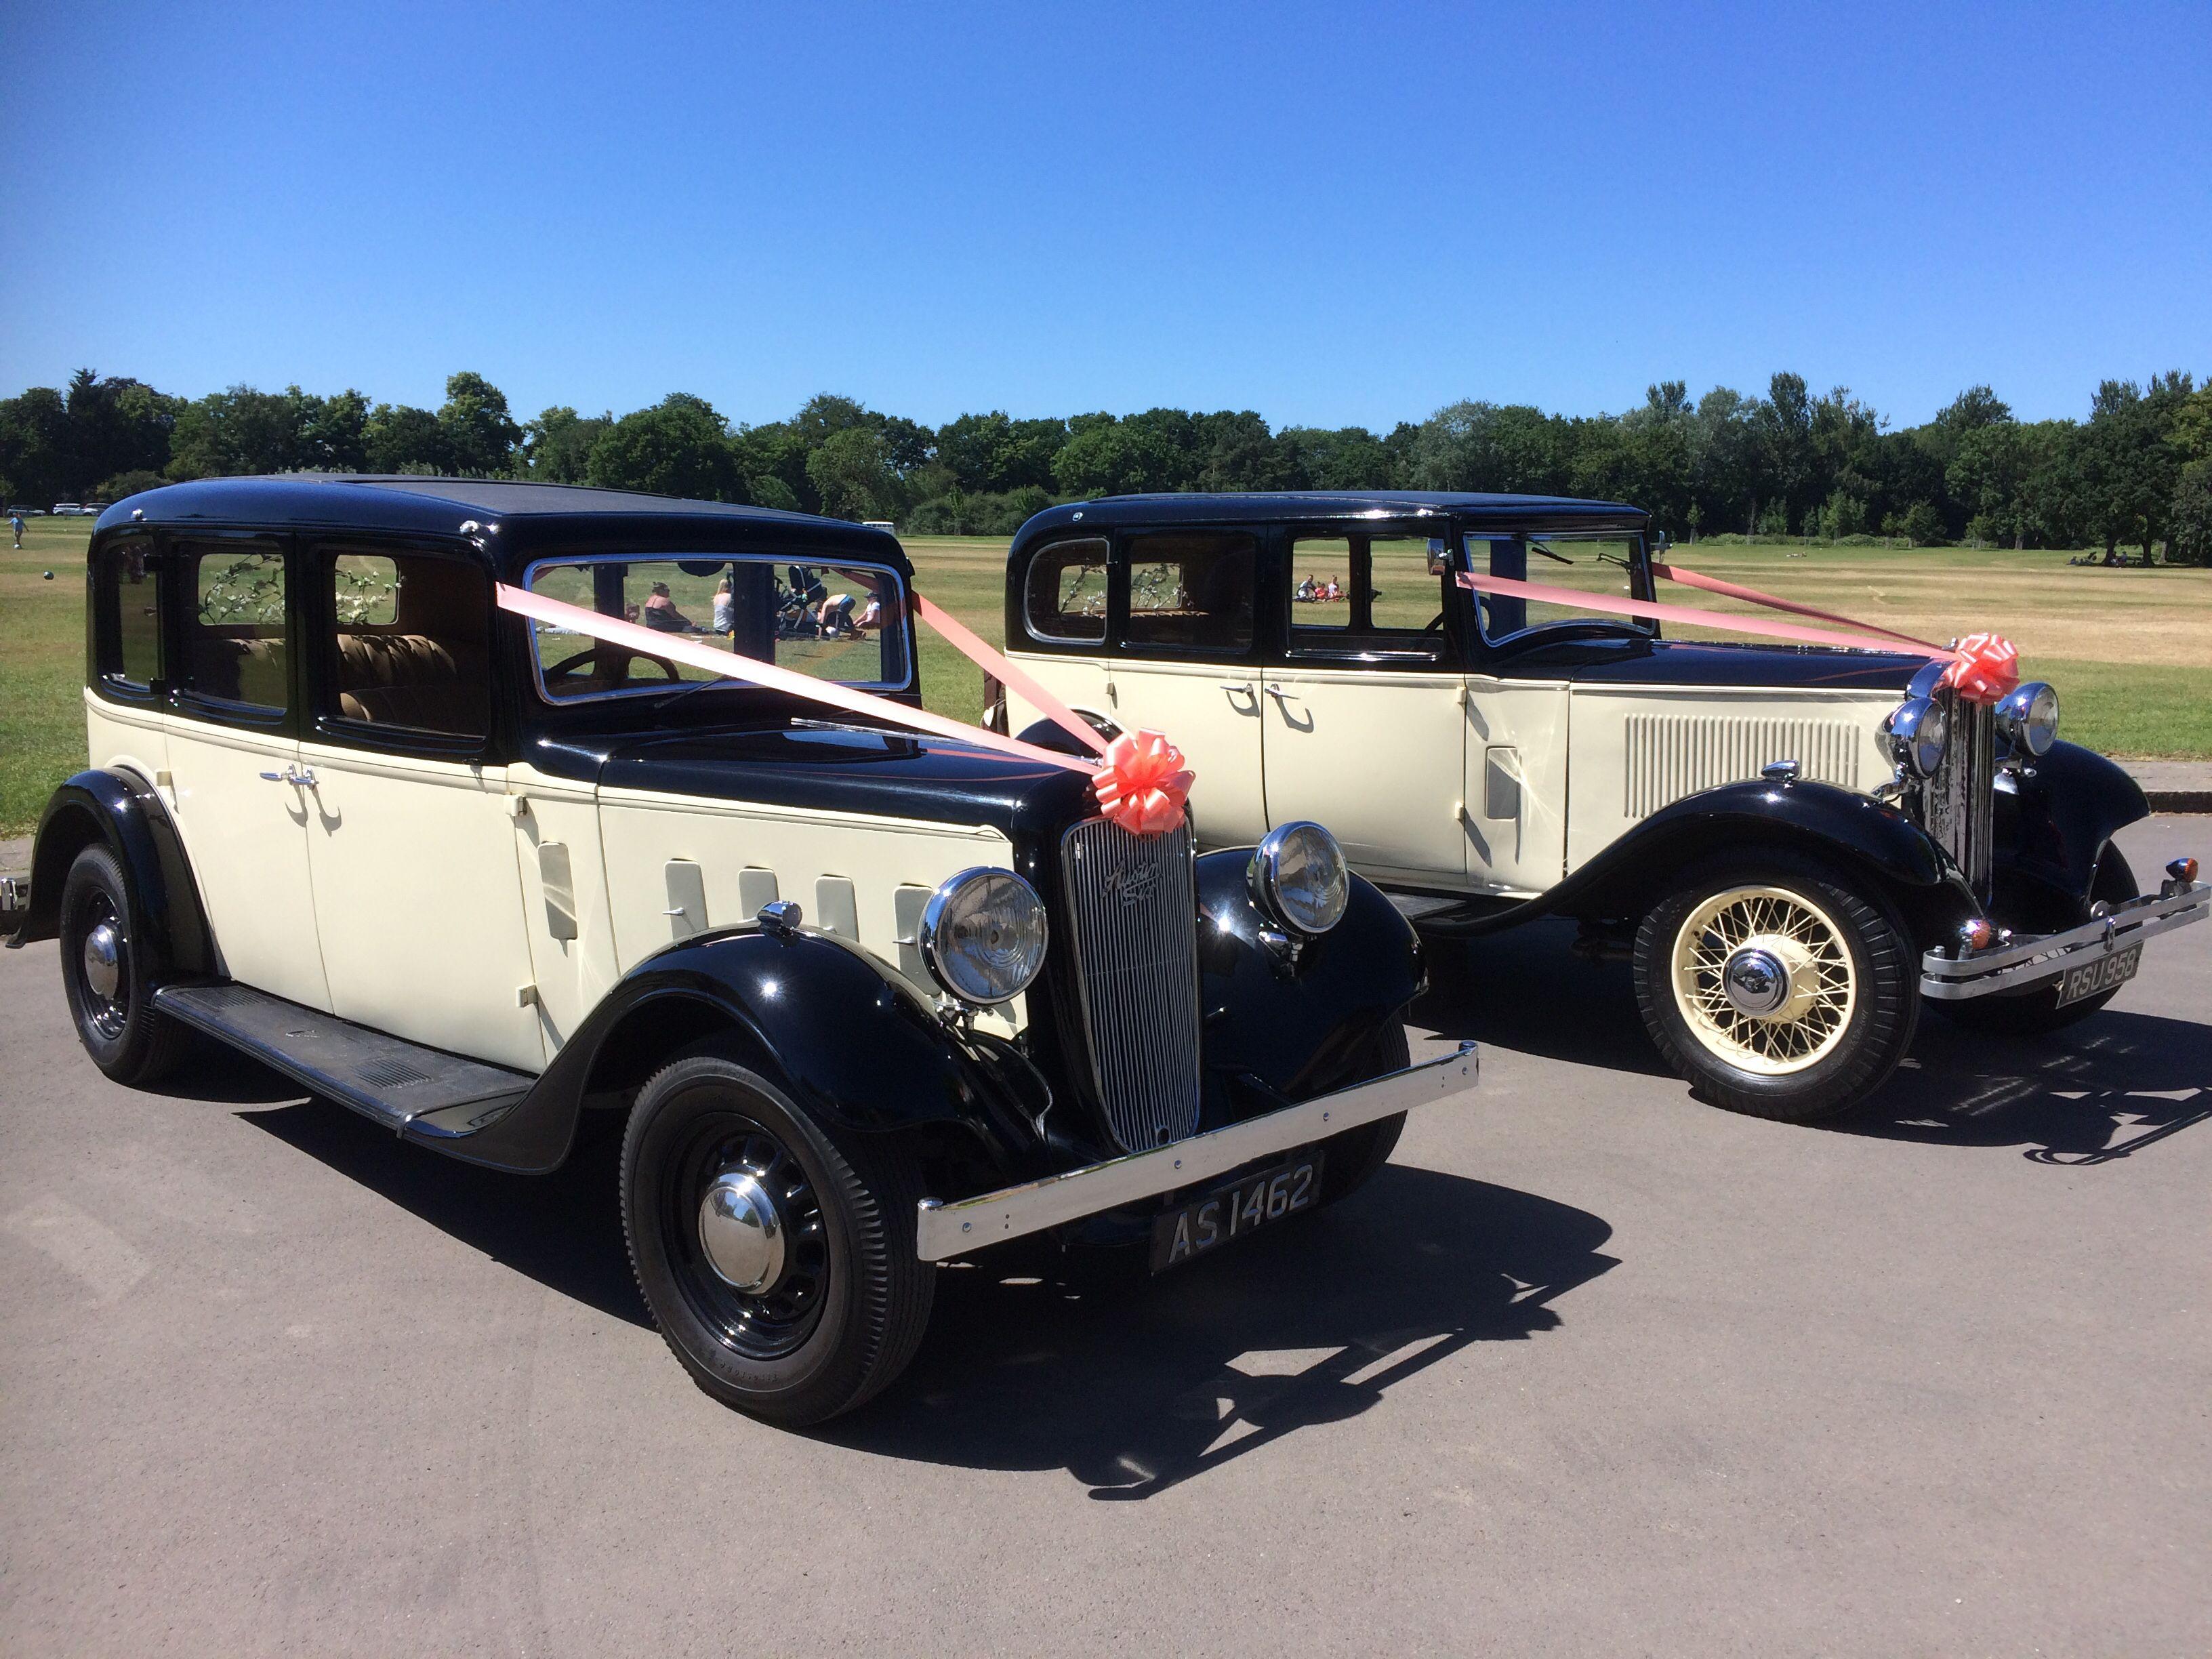 Pin By Jm Wedding Cars On Jm Wedding Cars Vintage Car Wedding Wedding Car Hire Wedding Car